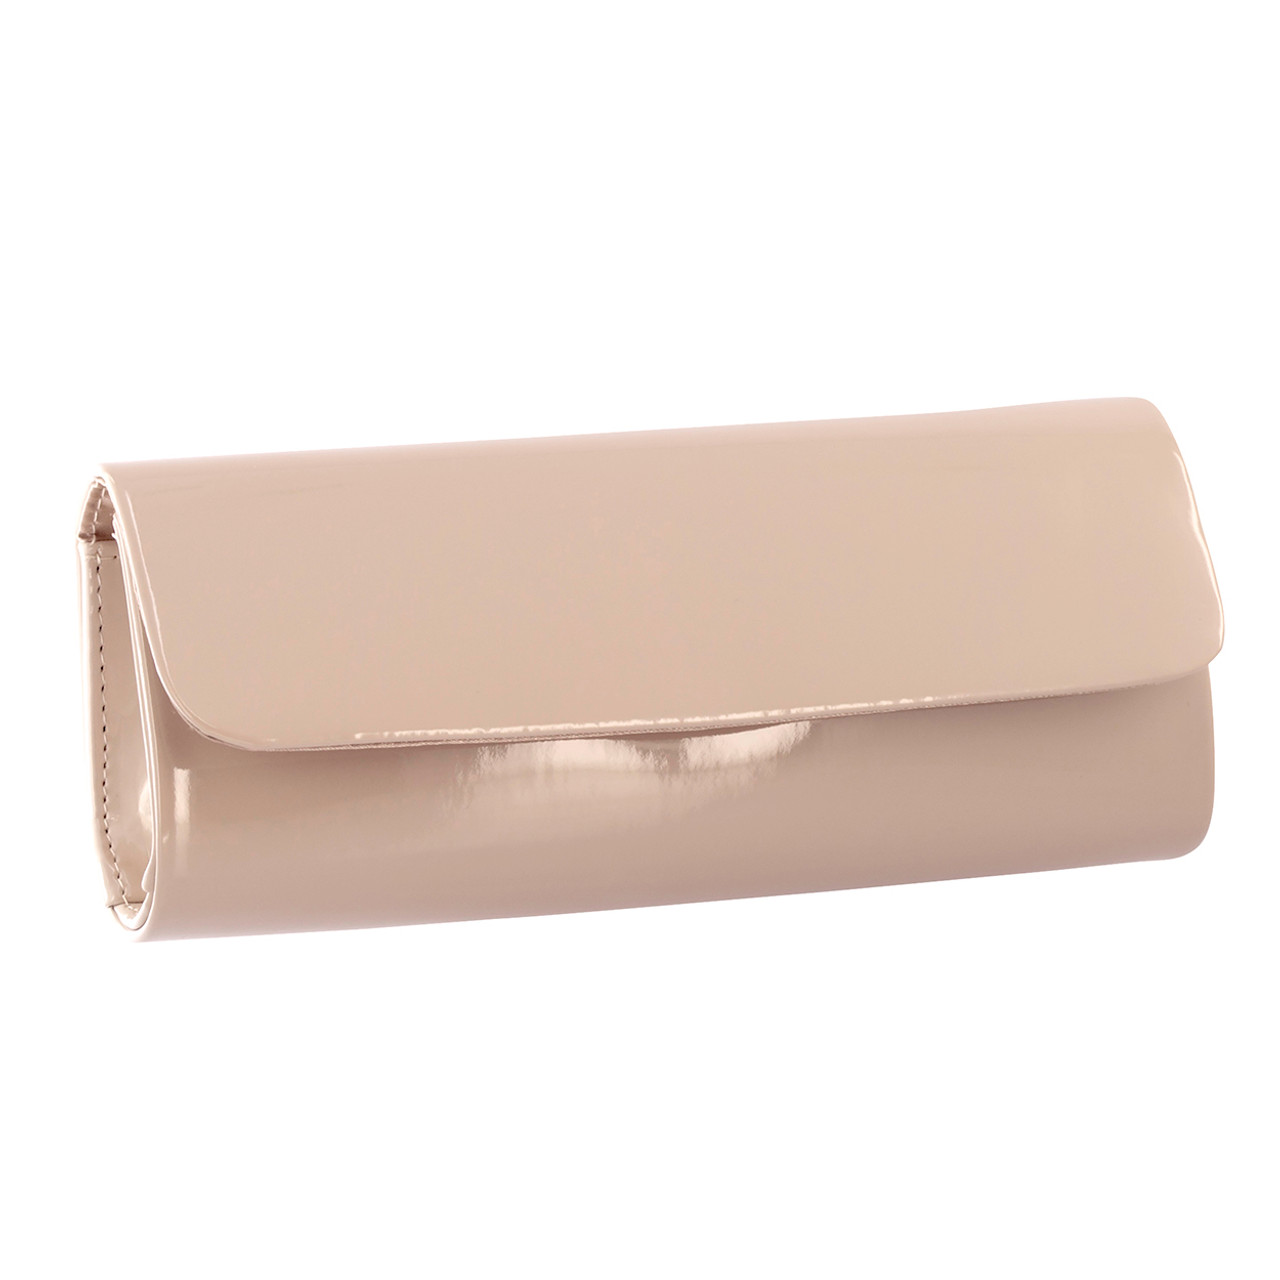 Liz Rene Handbag Robel - B781 Nude